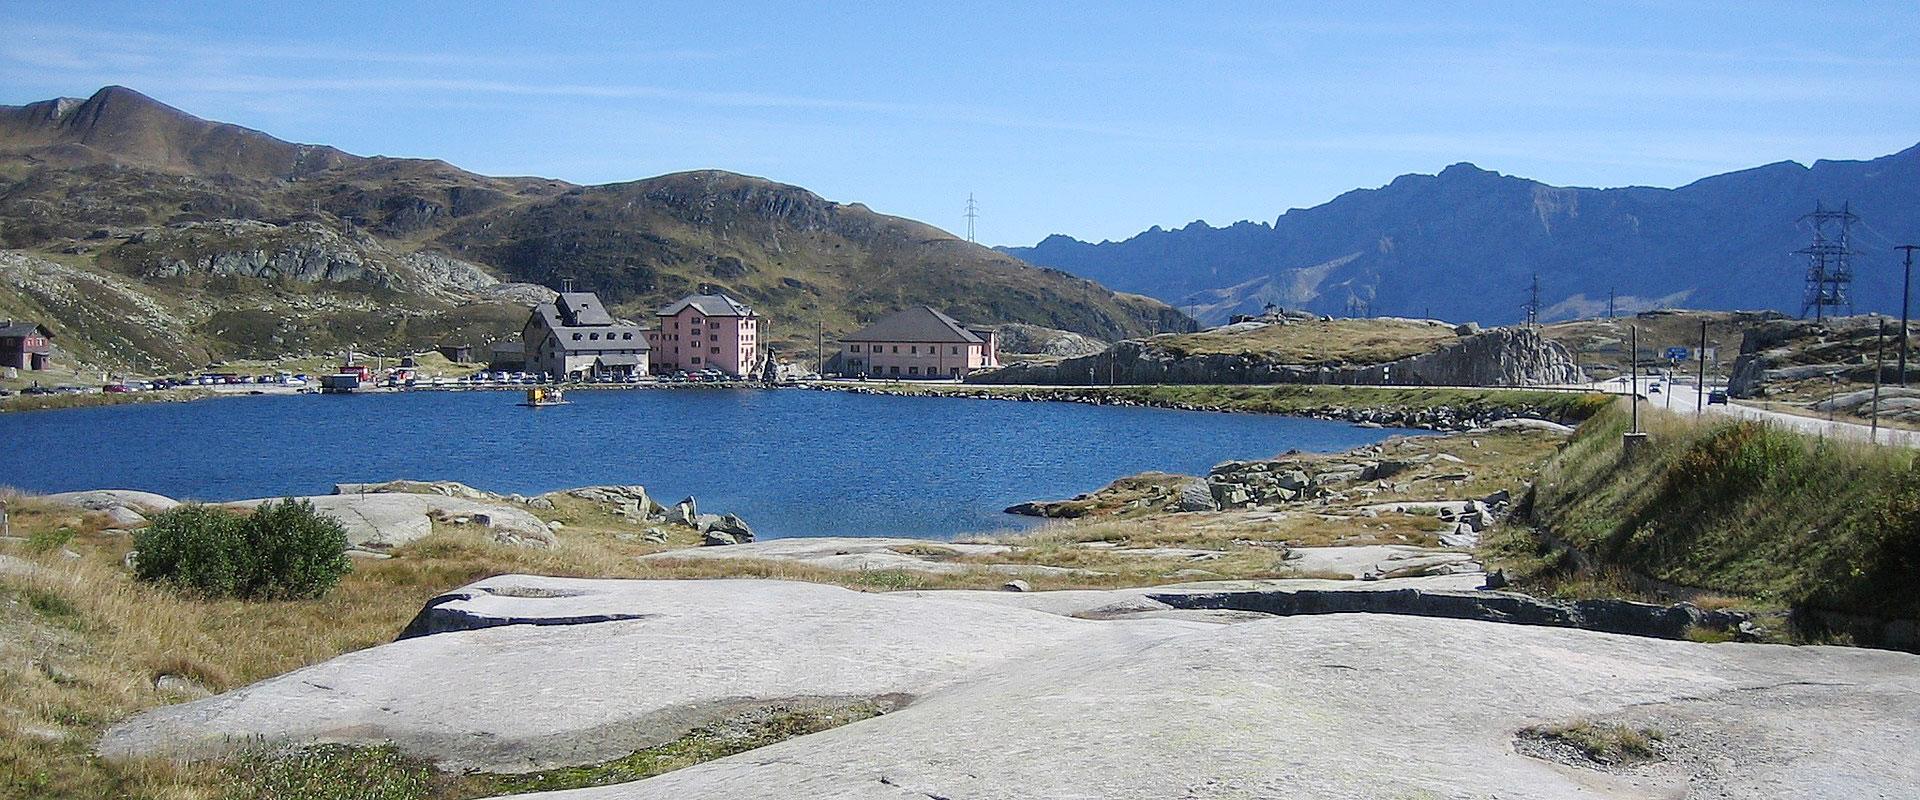 Gotthard-Passhöhe im Kanton Uri